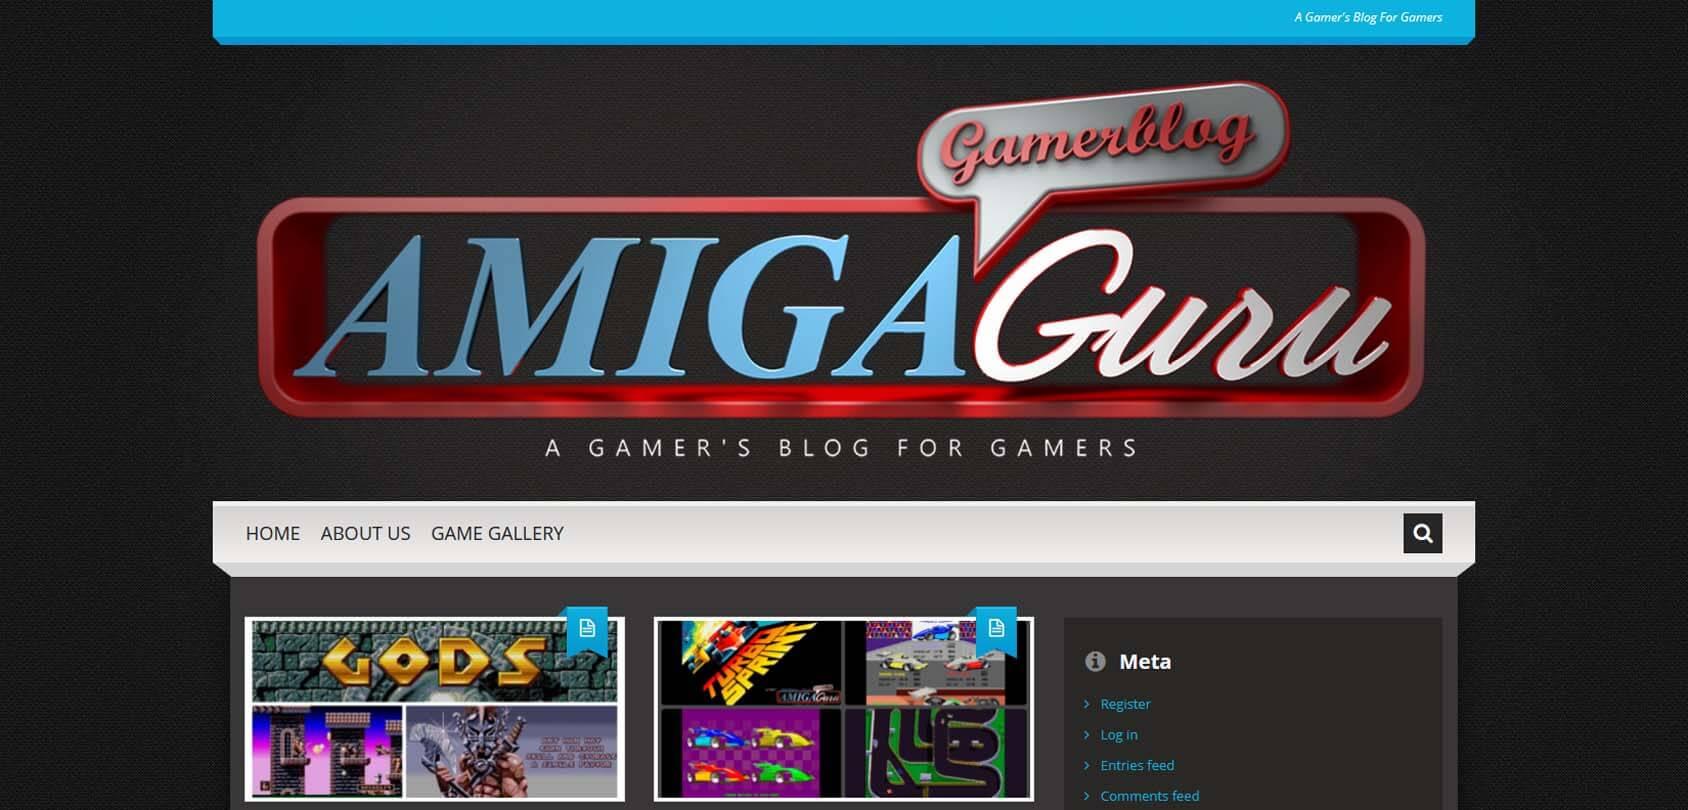 AmigaGuru Homepage